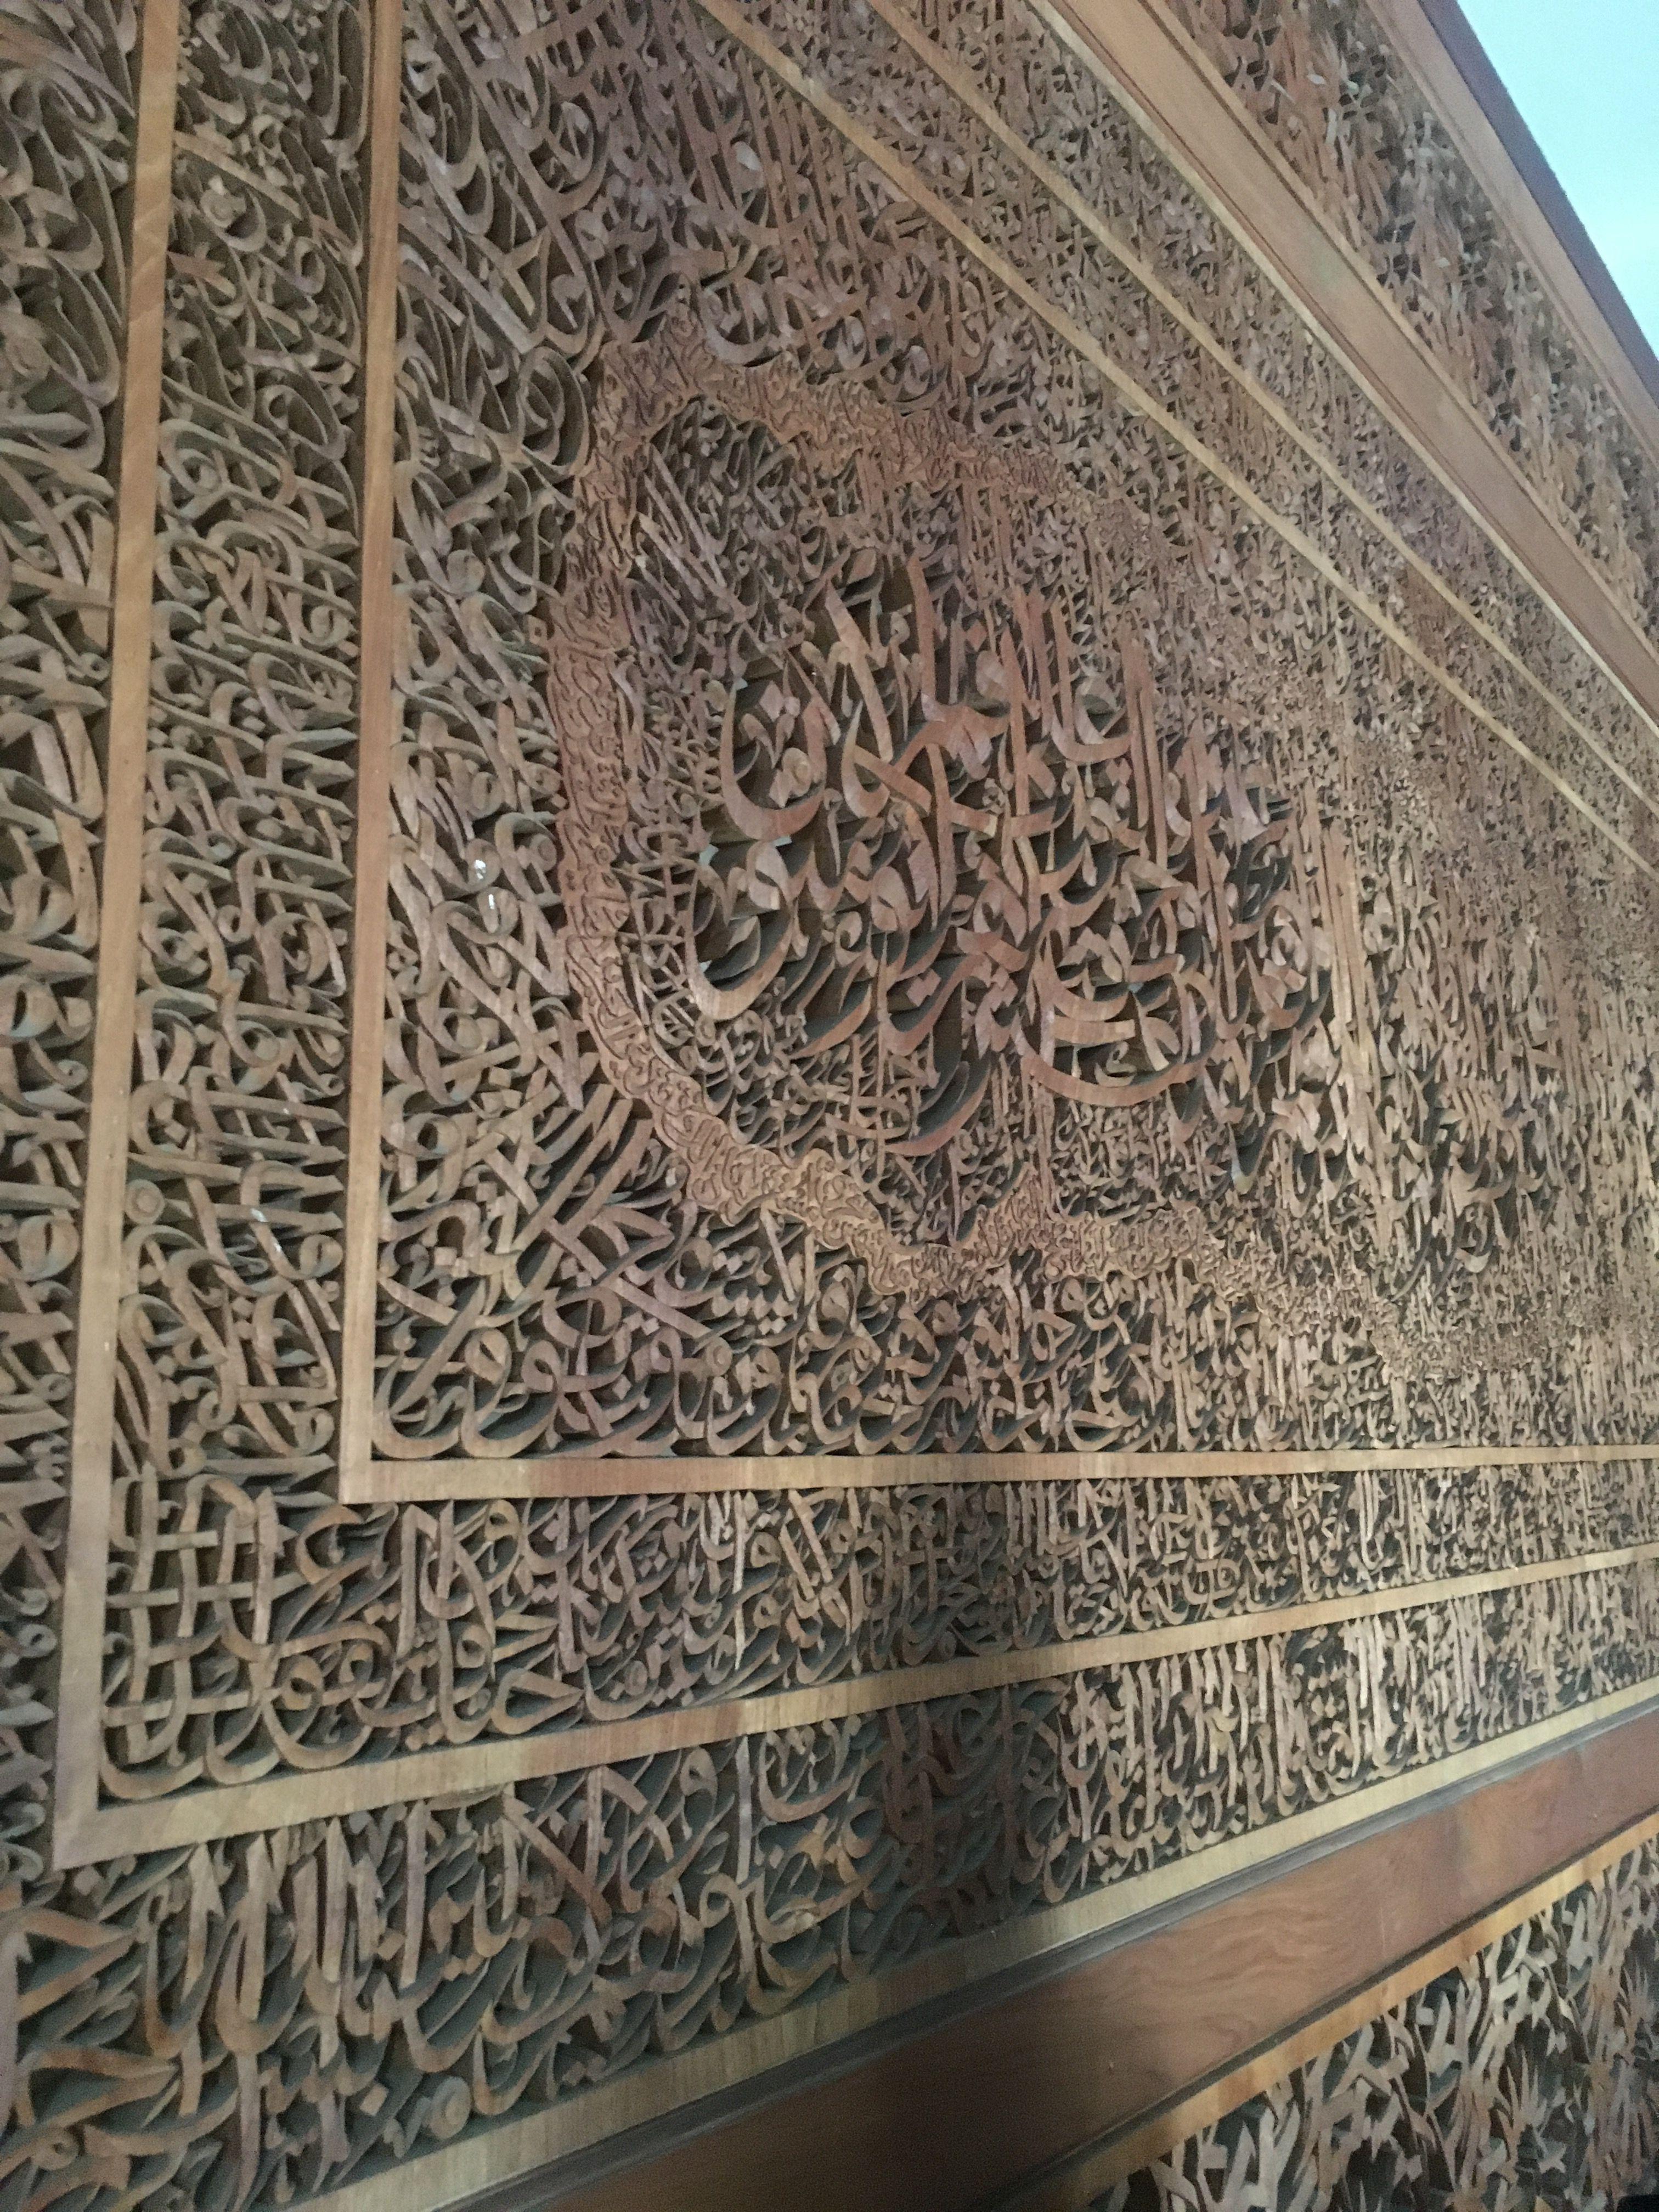 Kaligrafi surat yasin, al fatihah, al ikhlas Ukuran